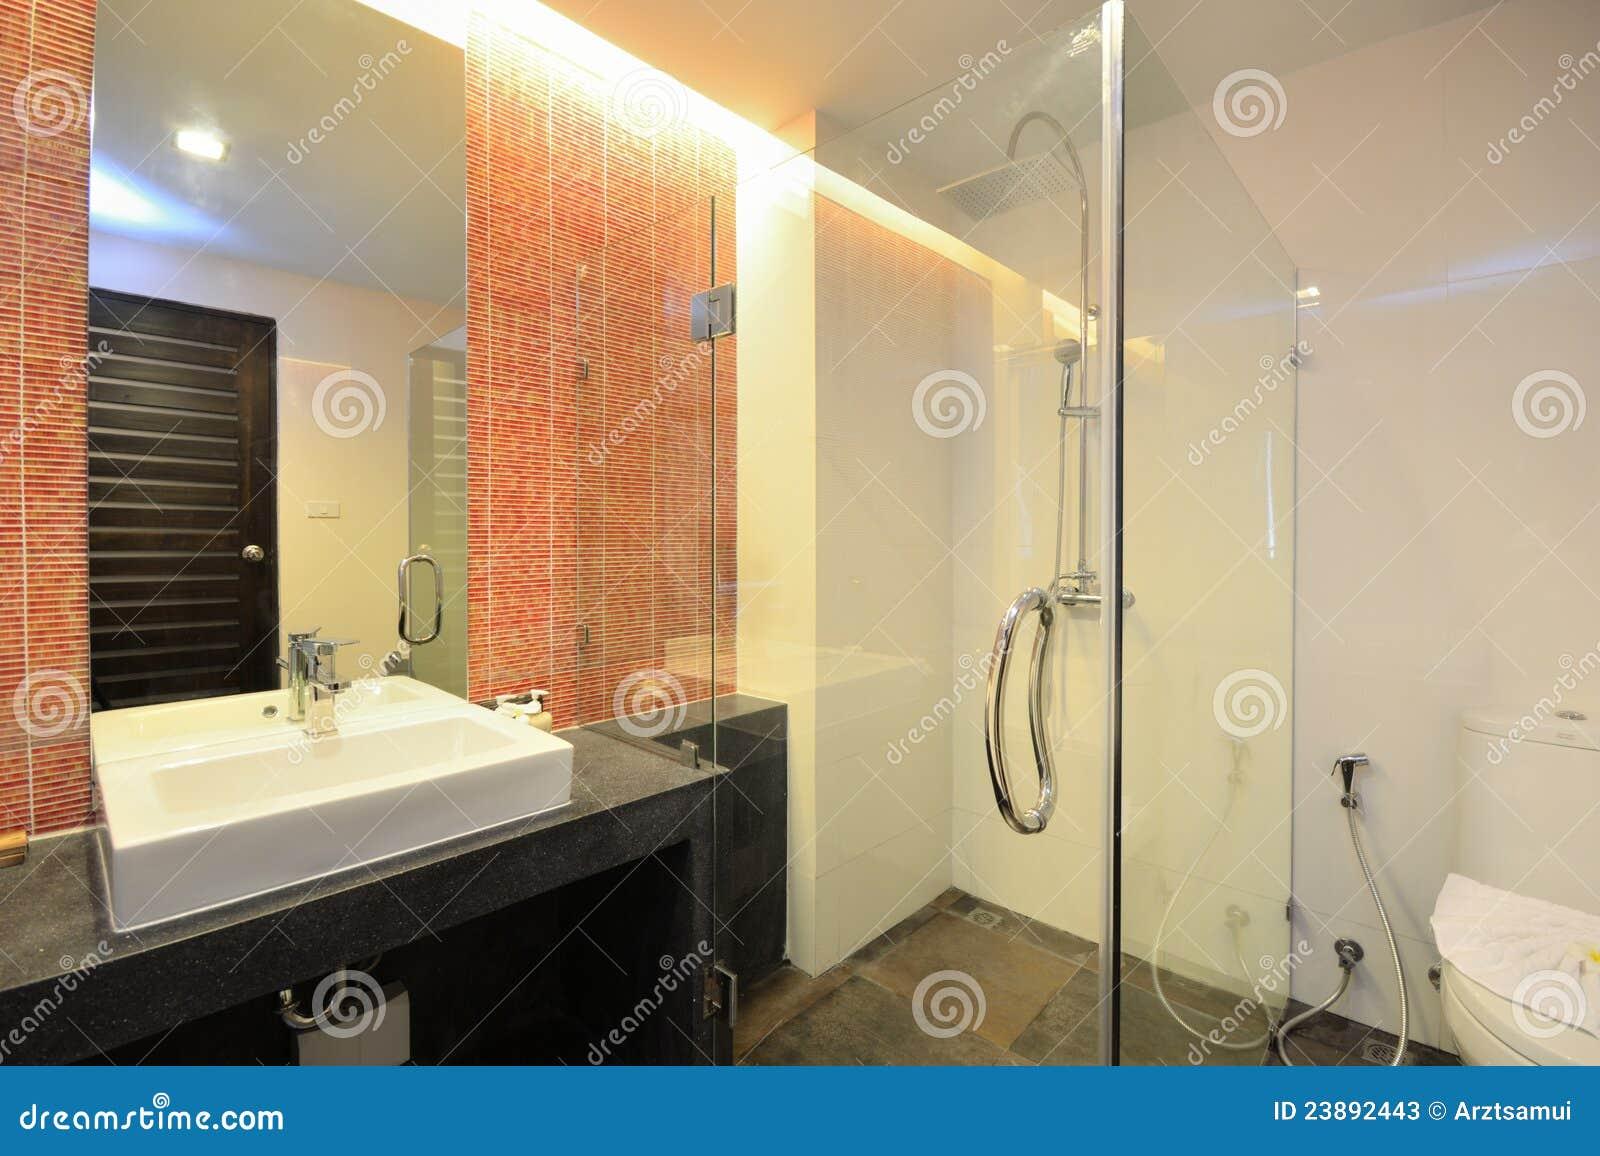 Conception de salle de bains